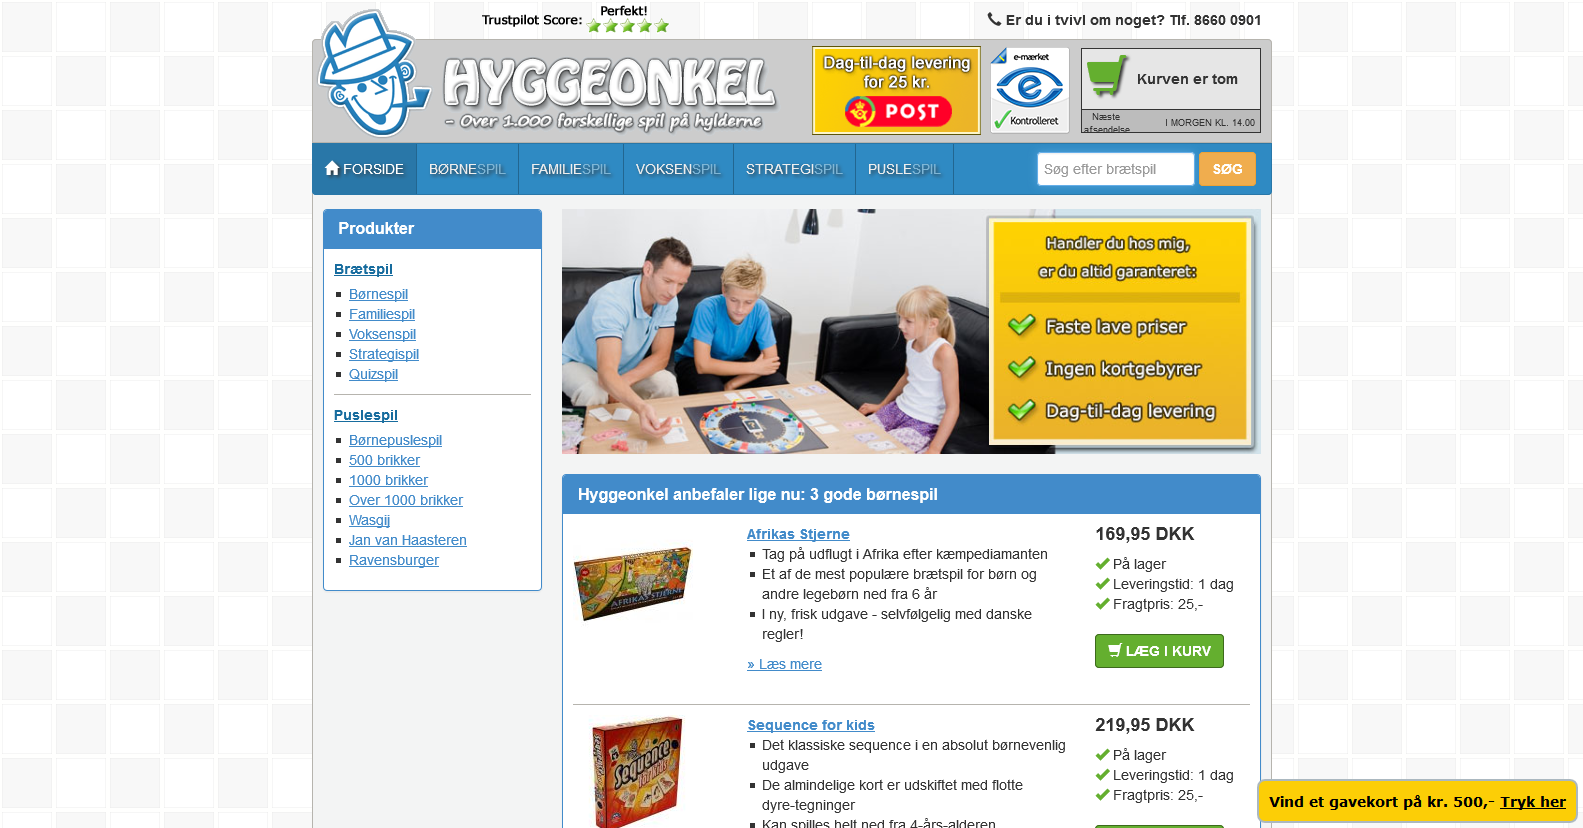 hyggeonkel.dk_1